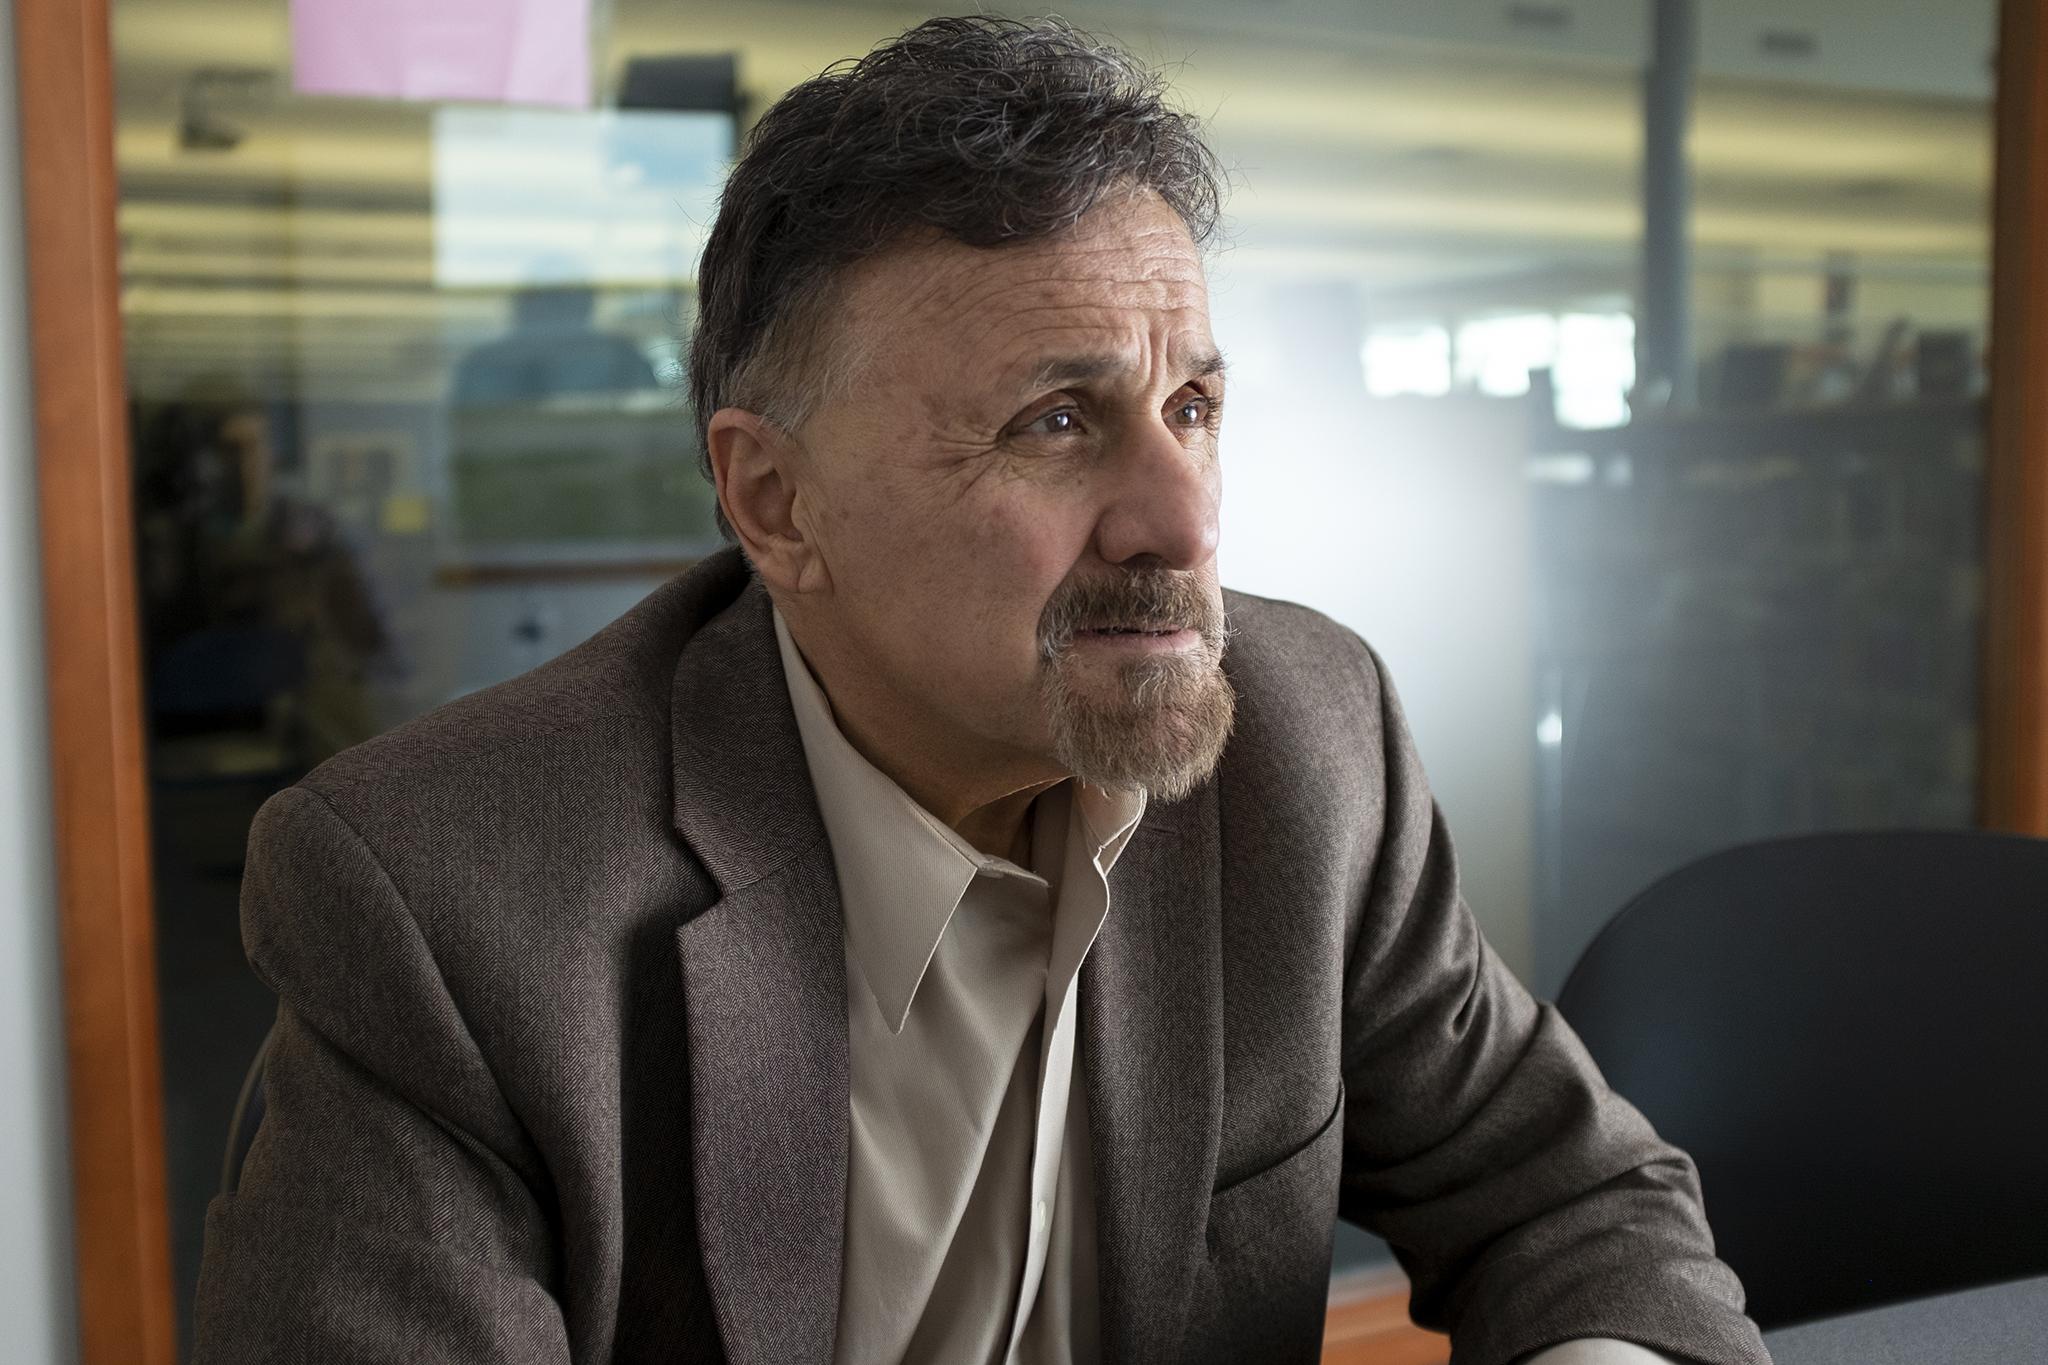 Photo: Frank DeAngelis Columbine Principal - Since Columbine